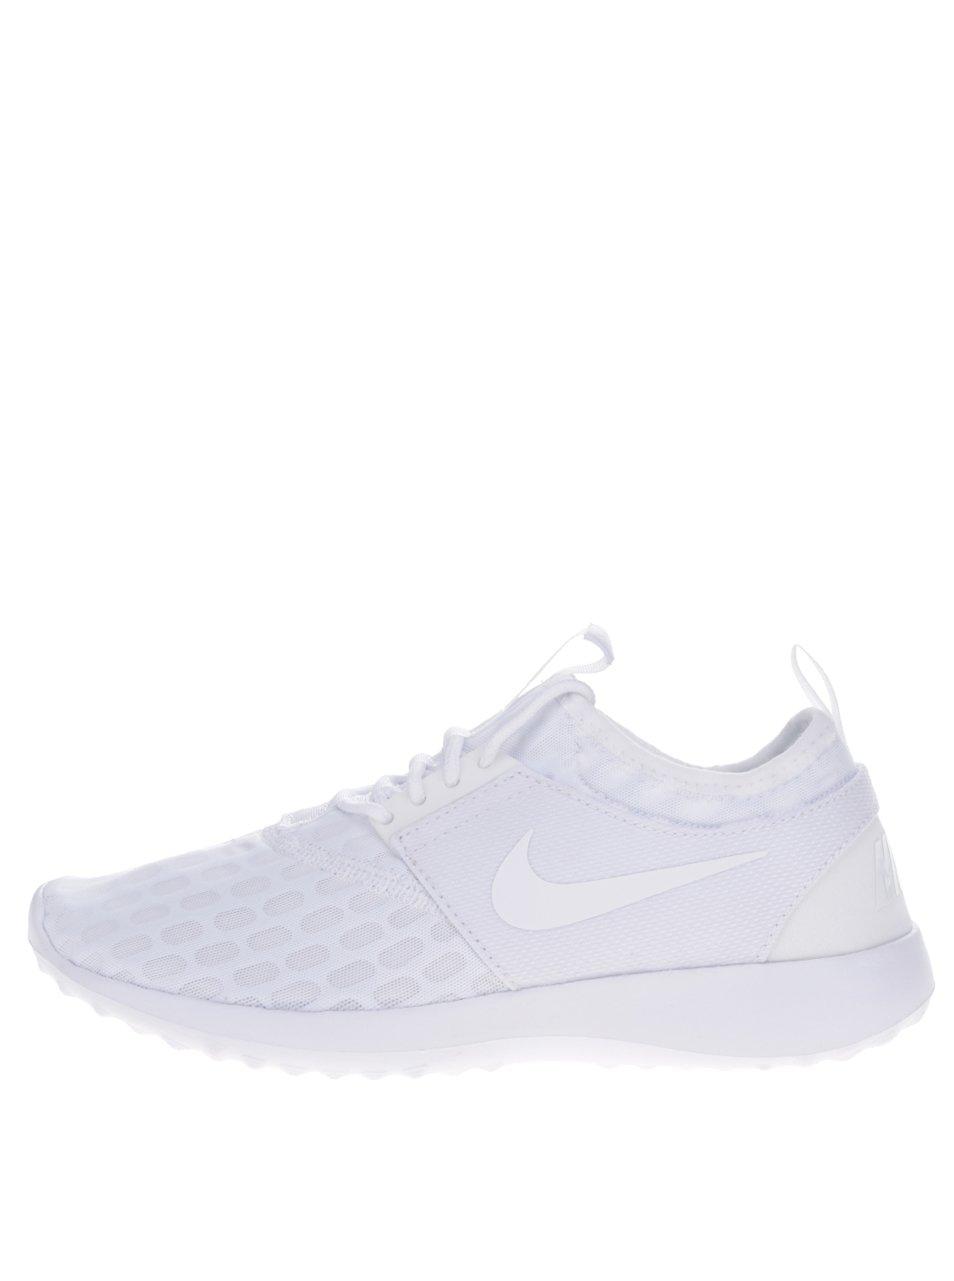 Biele dámske tenisky Nike Juvenate